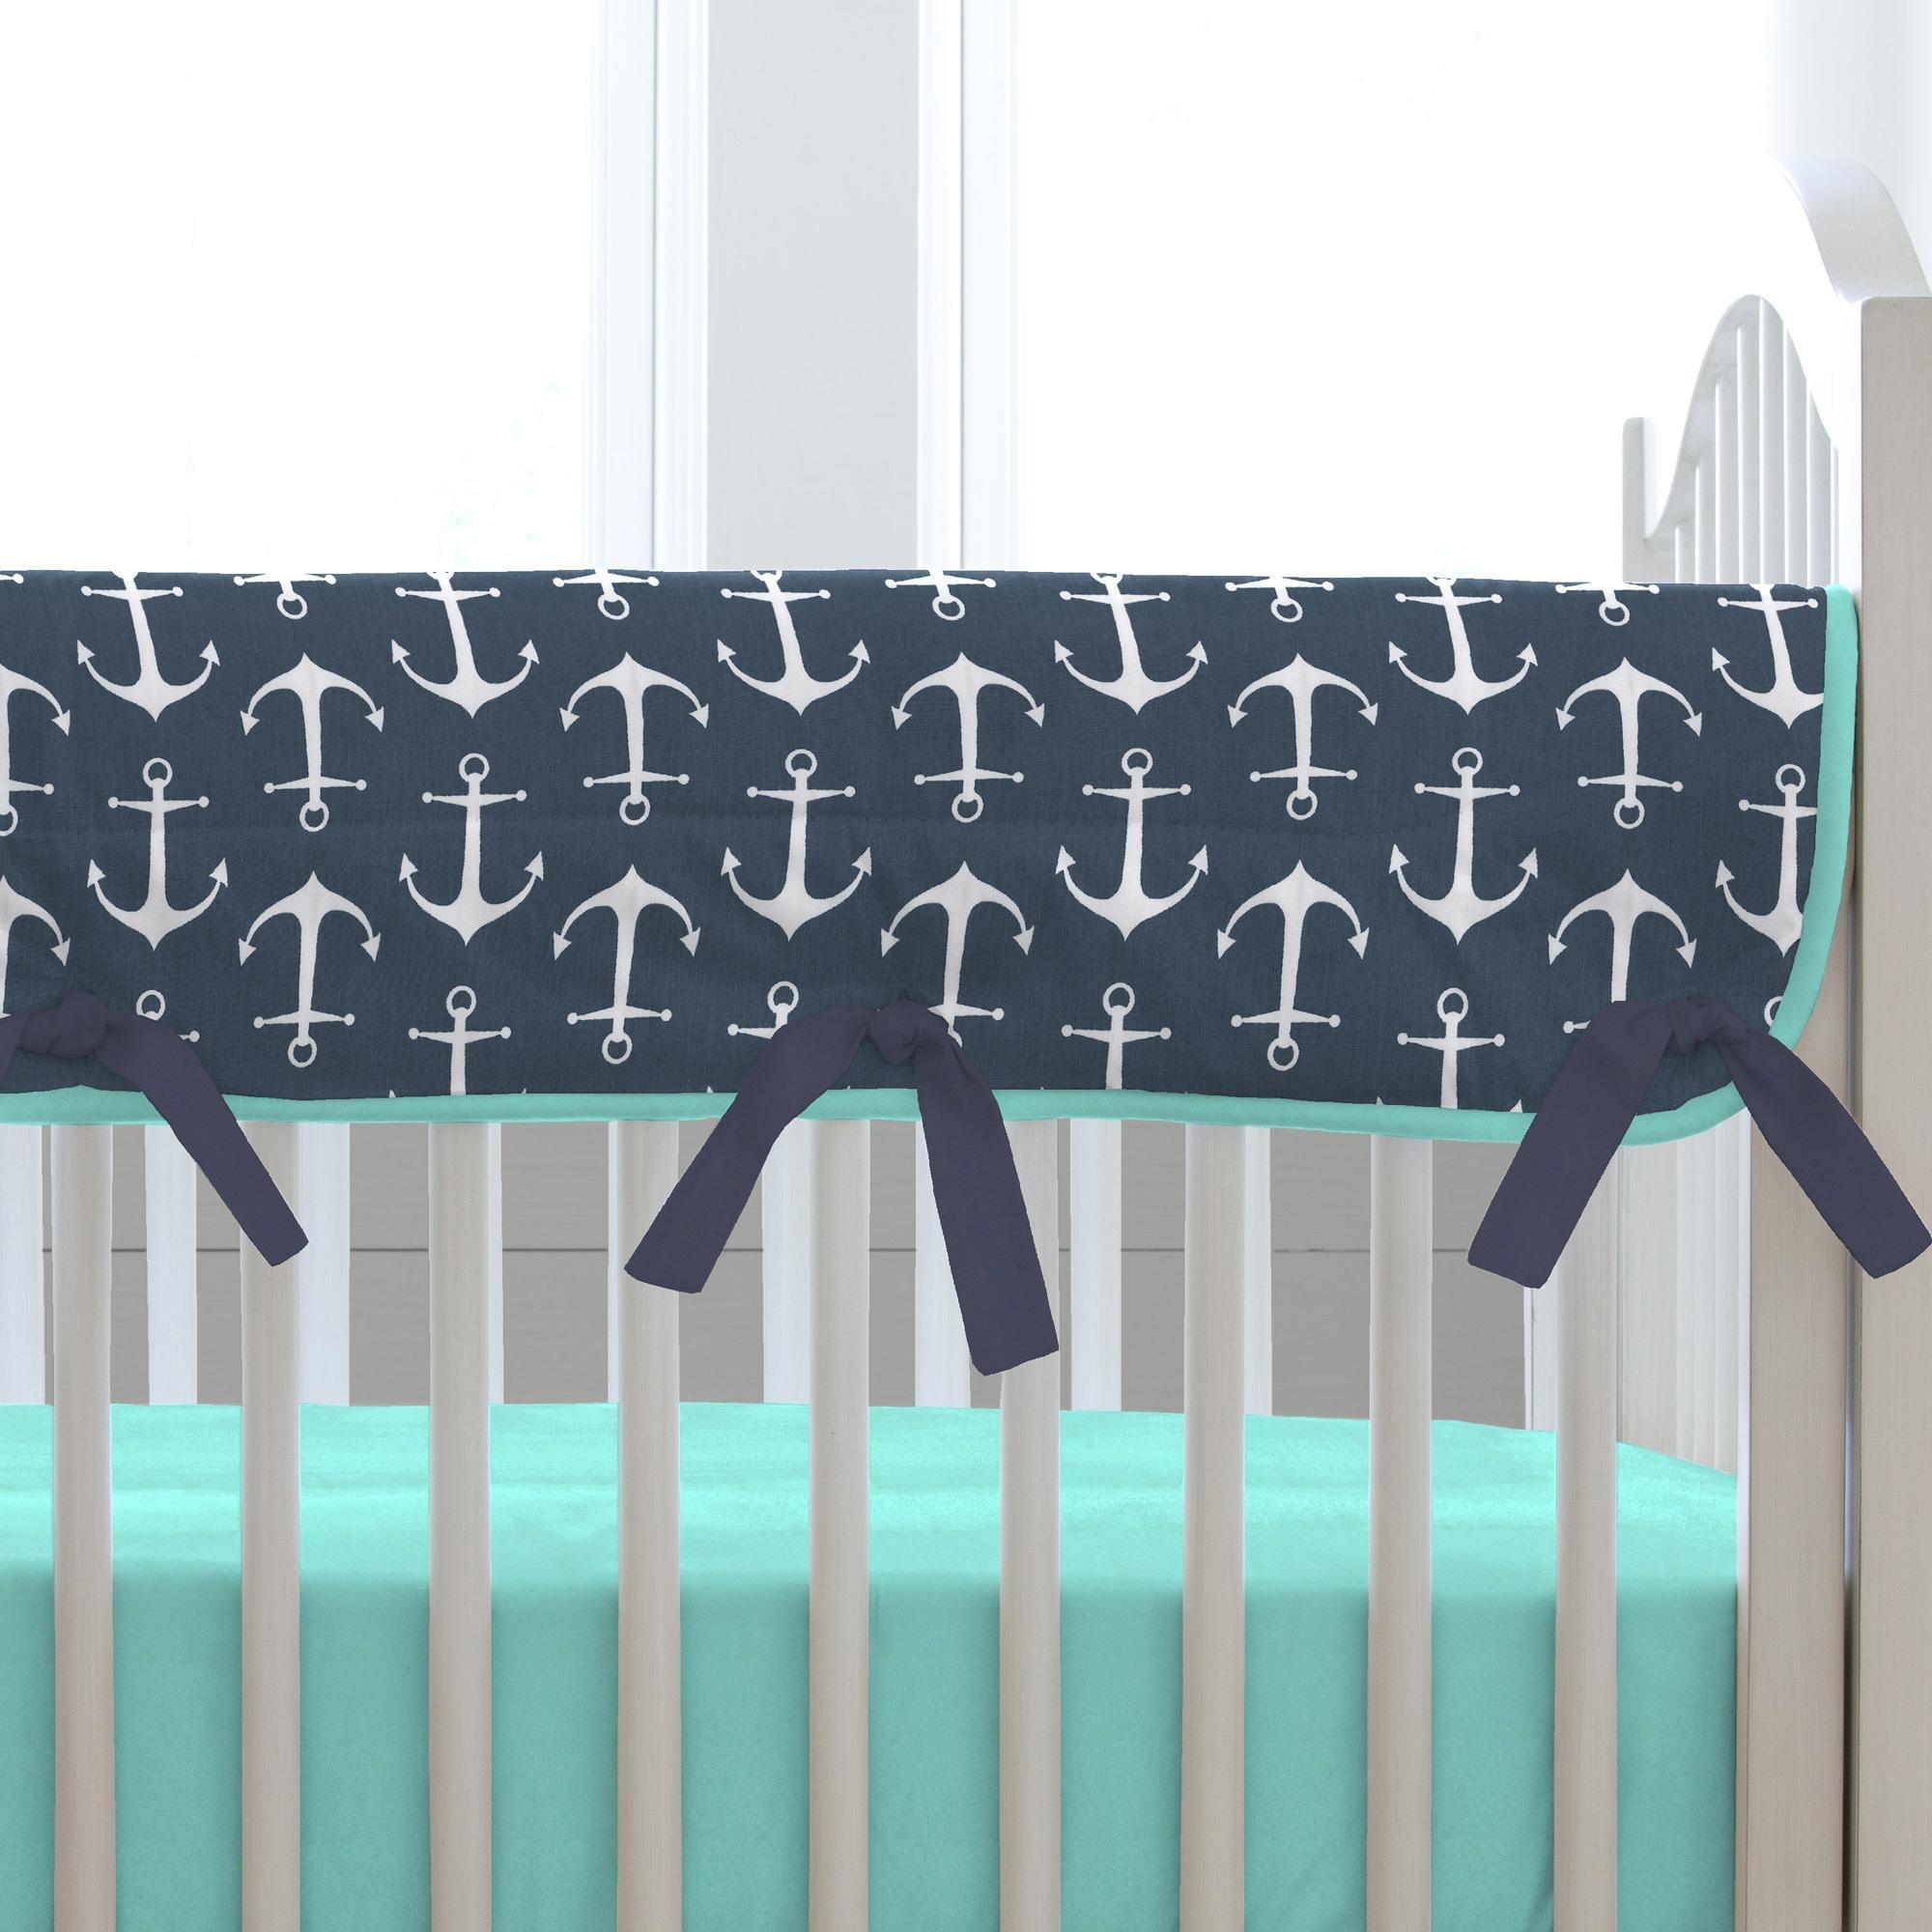 Carousel Designs Navy Anchors Crib Rail Cover by Carousel Designs